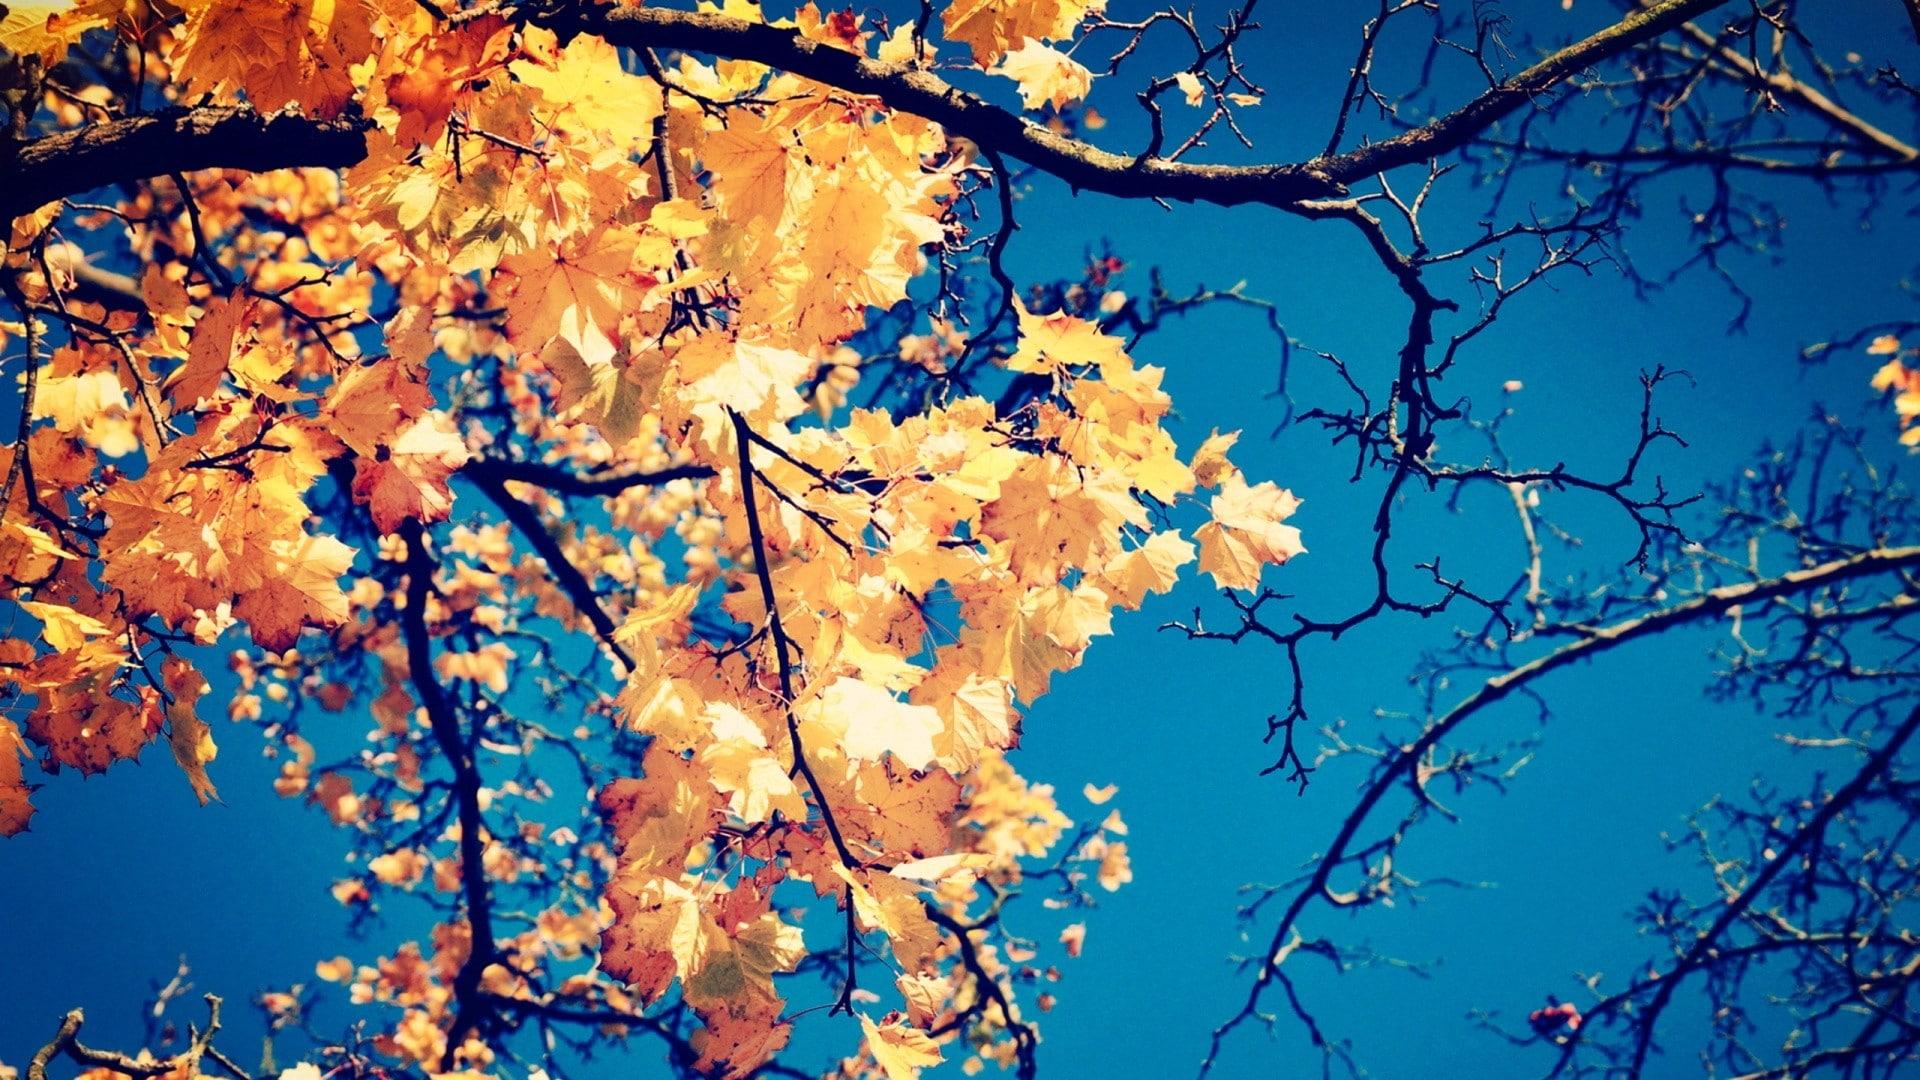 fall themed wallpaper